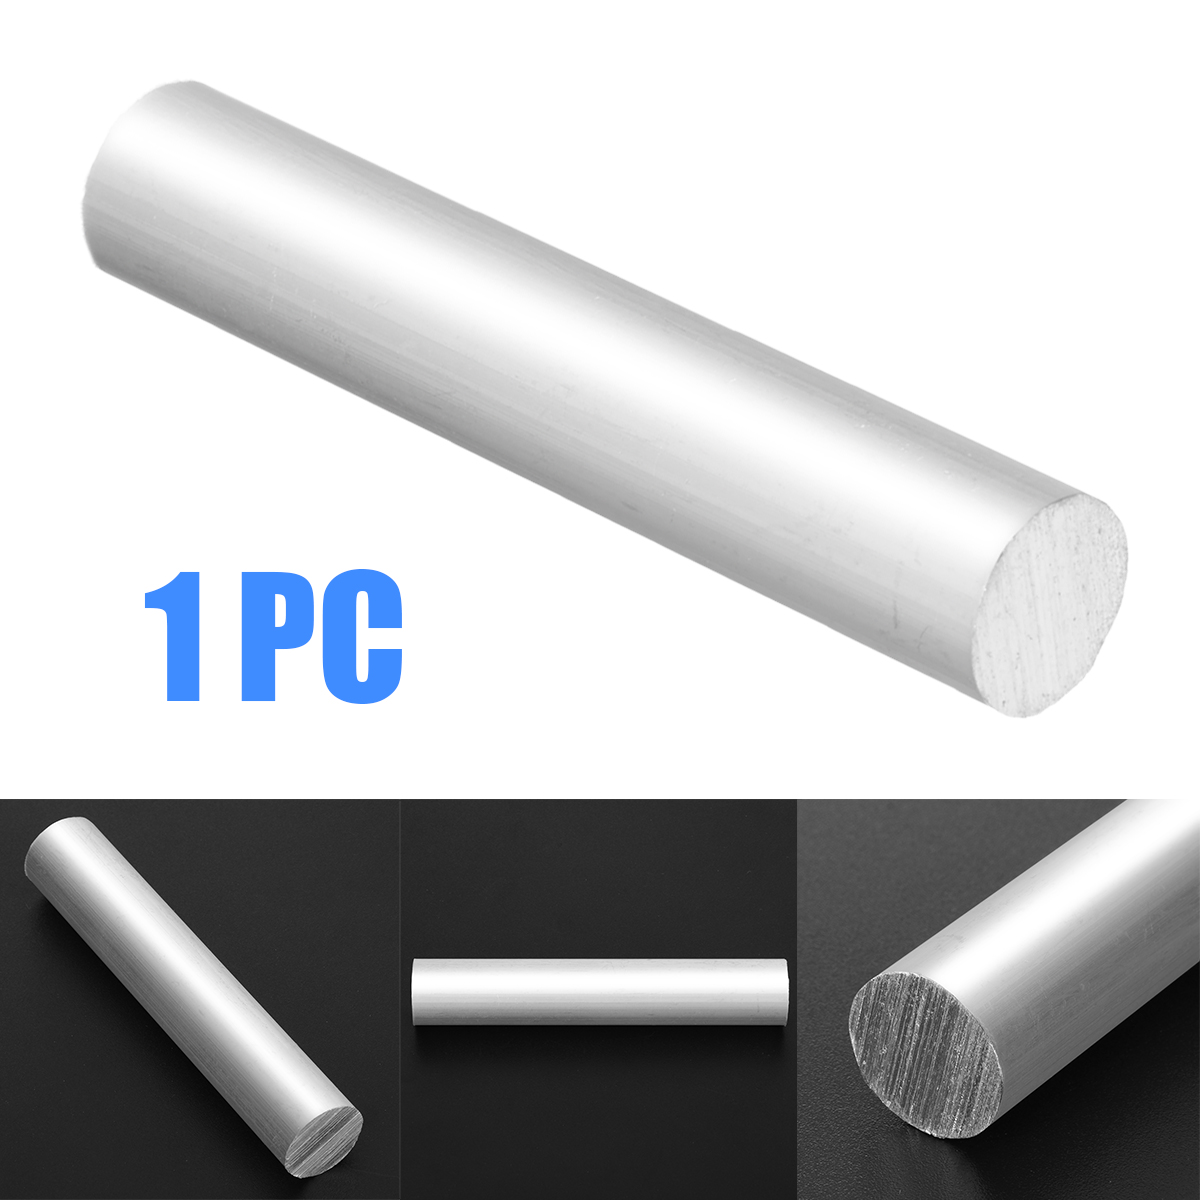 16mm x 9cm High Purity 99.99/% Mg Magnesium Metal Rod Bar Light a Fire Outdoors